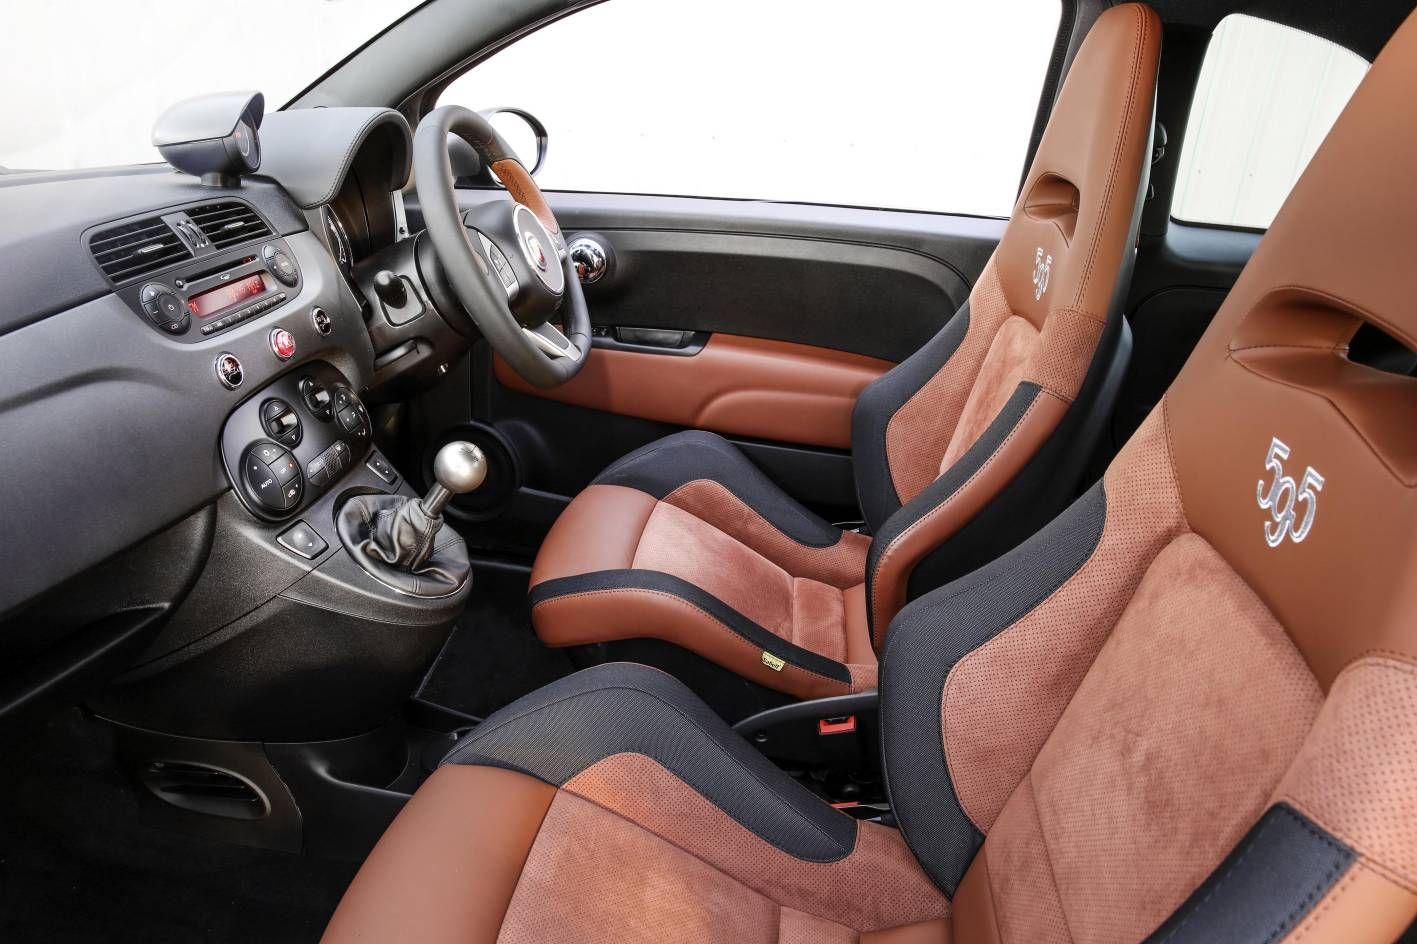 abarth-595-competizione-interior.jpg 1 417×944 píxeis | ABARTH ...